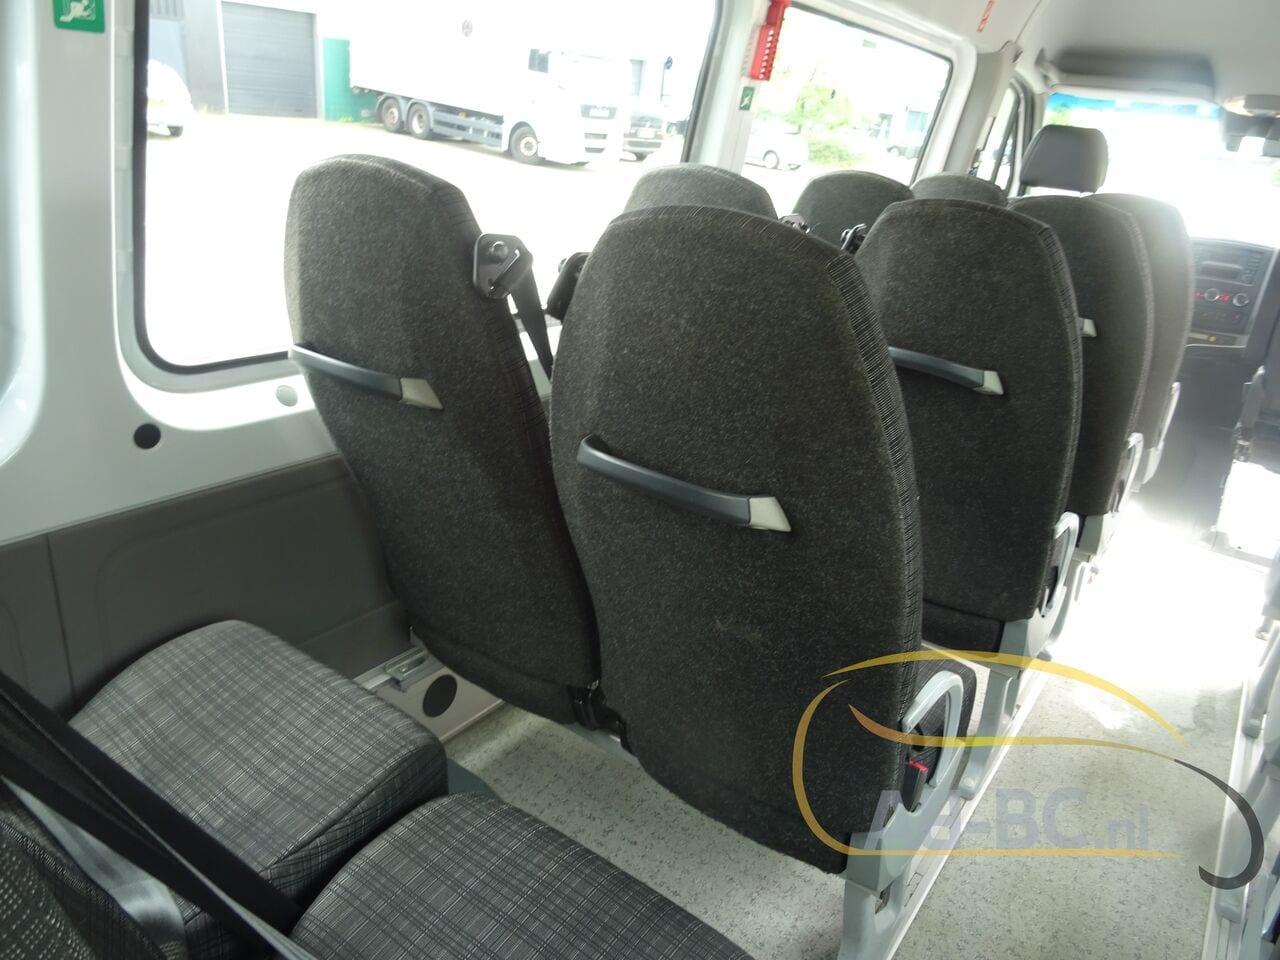 coach-busMERCEDES-BENZ-516-CDI-Sprinter-Transfer-45-23-Seats-EURO-6---1625235097425728836_big_da3d336b61bcba3b49cda5b9a26a883b--21060112394245379500